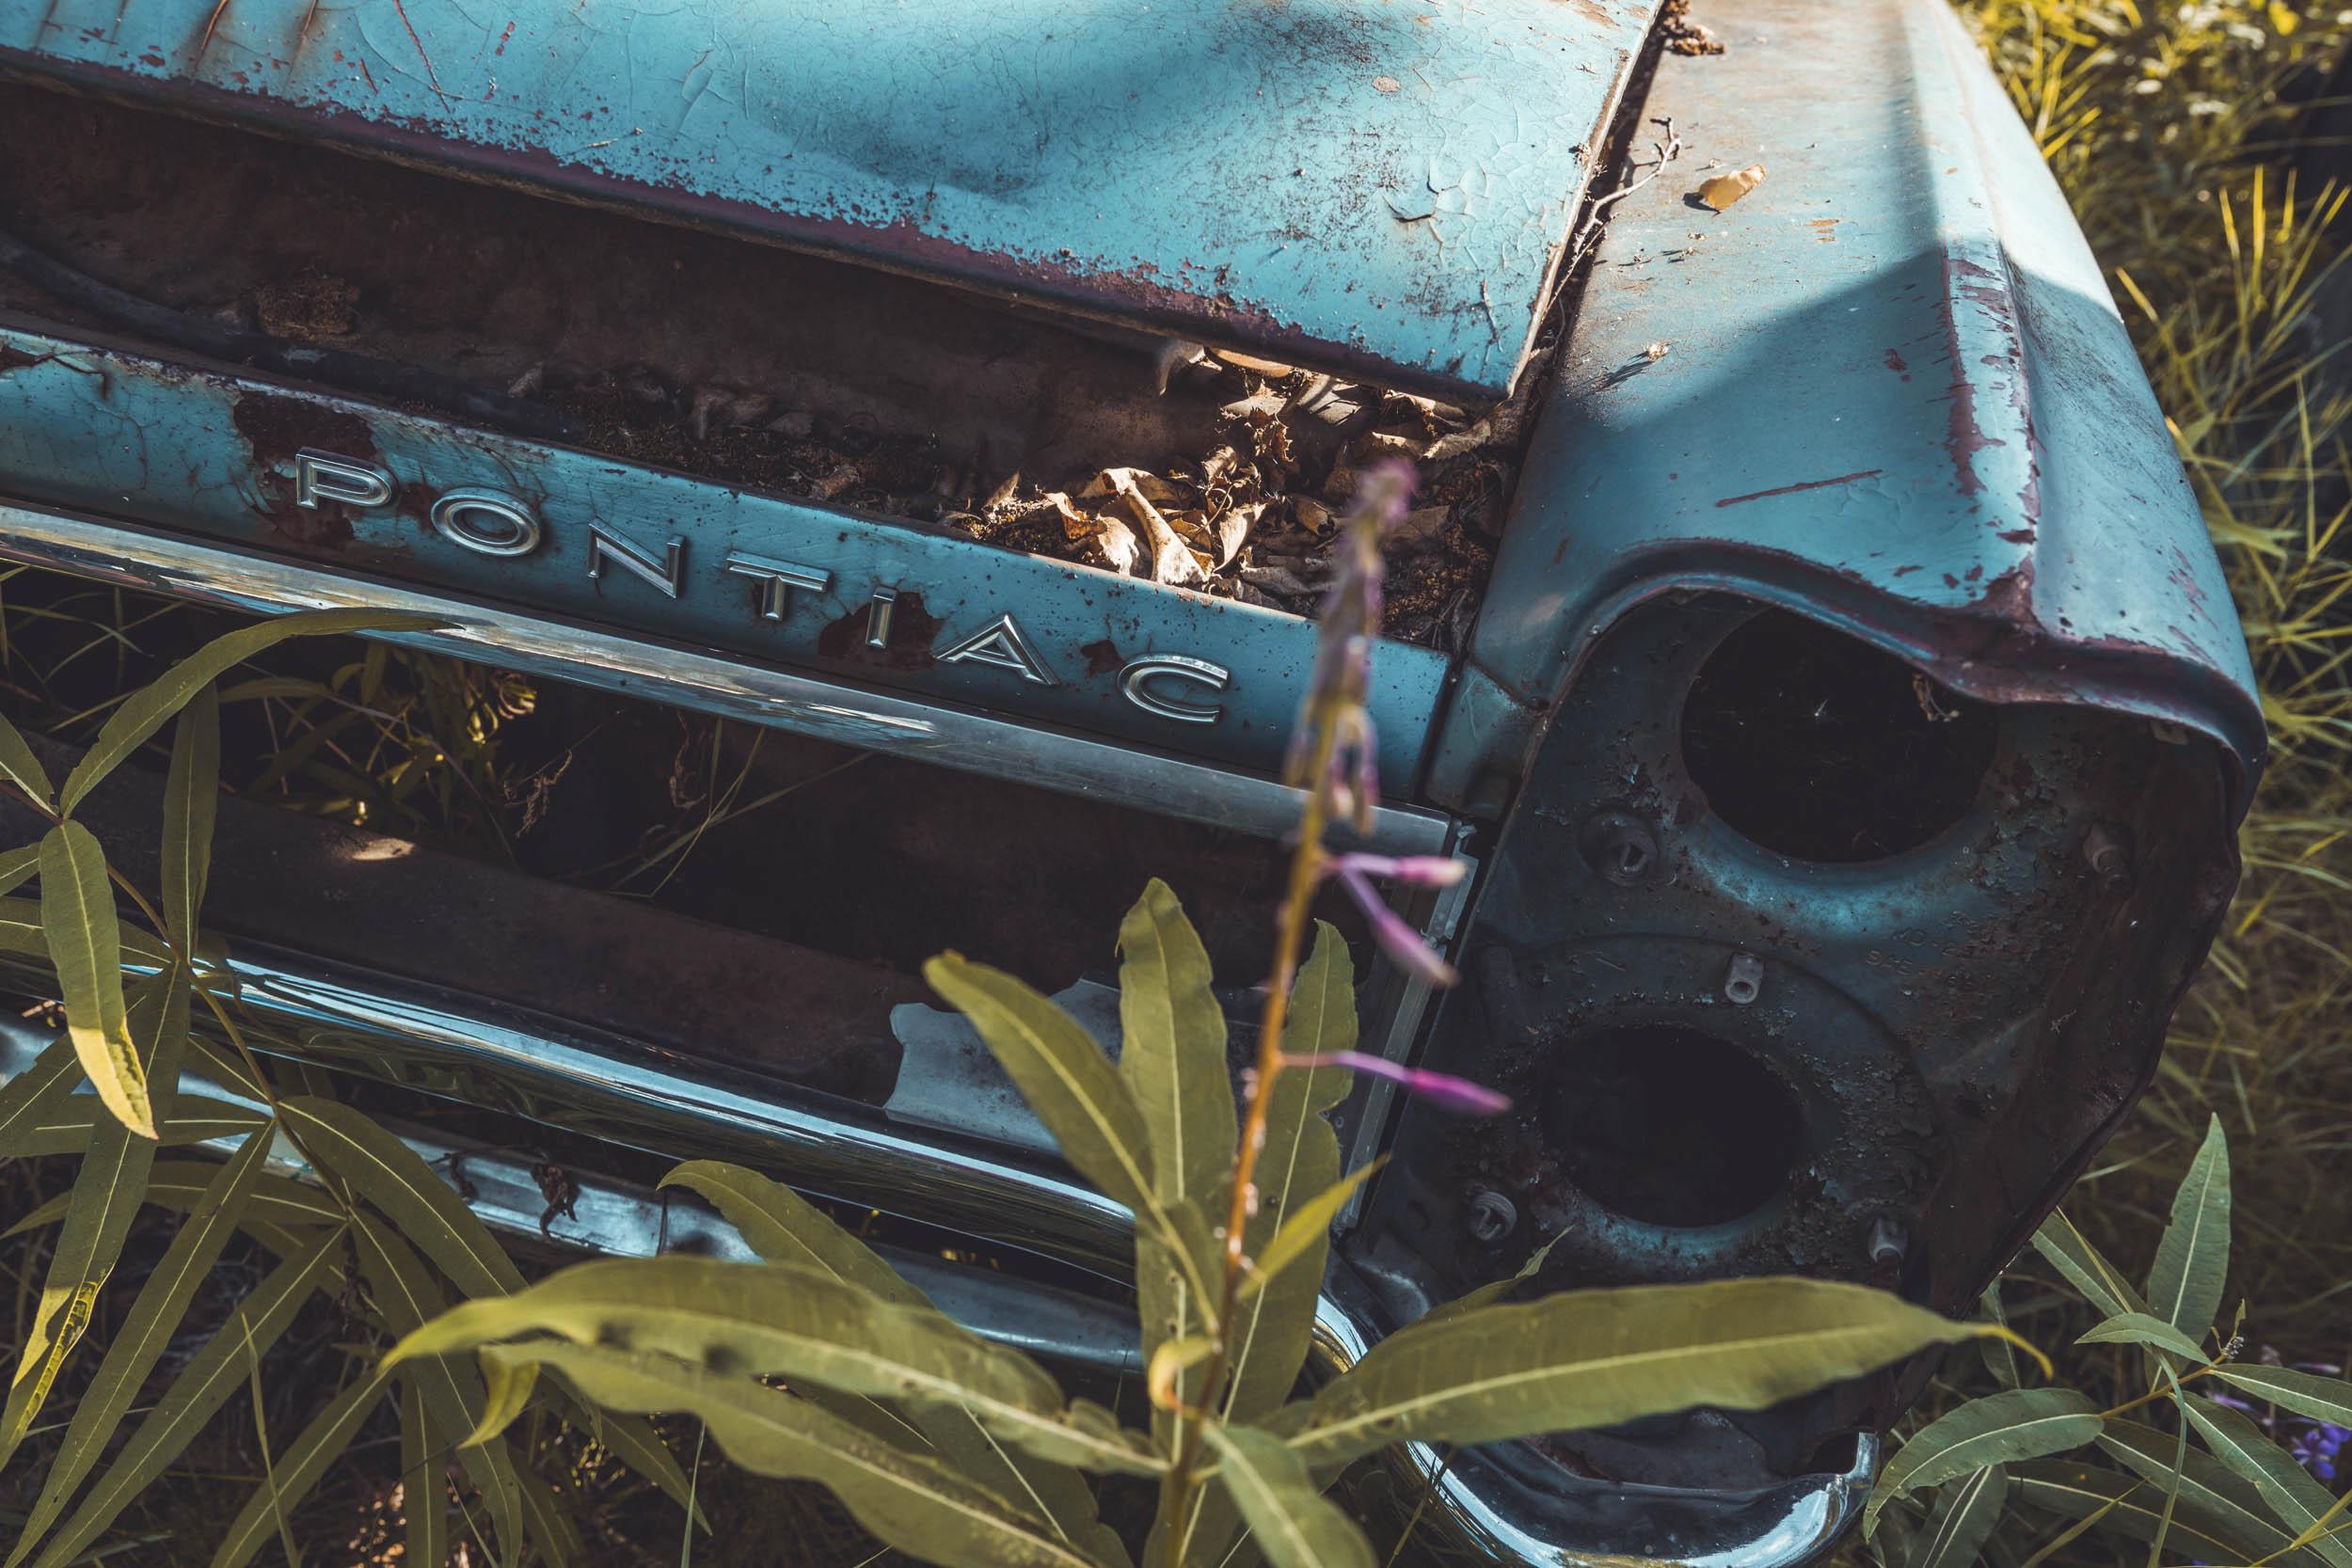 decaying Pontiac